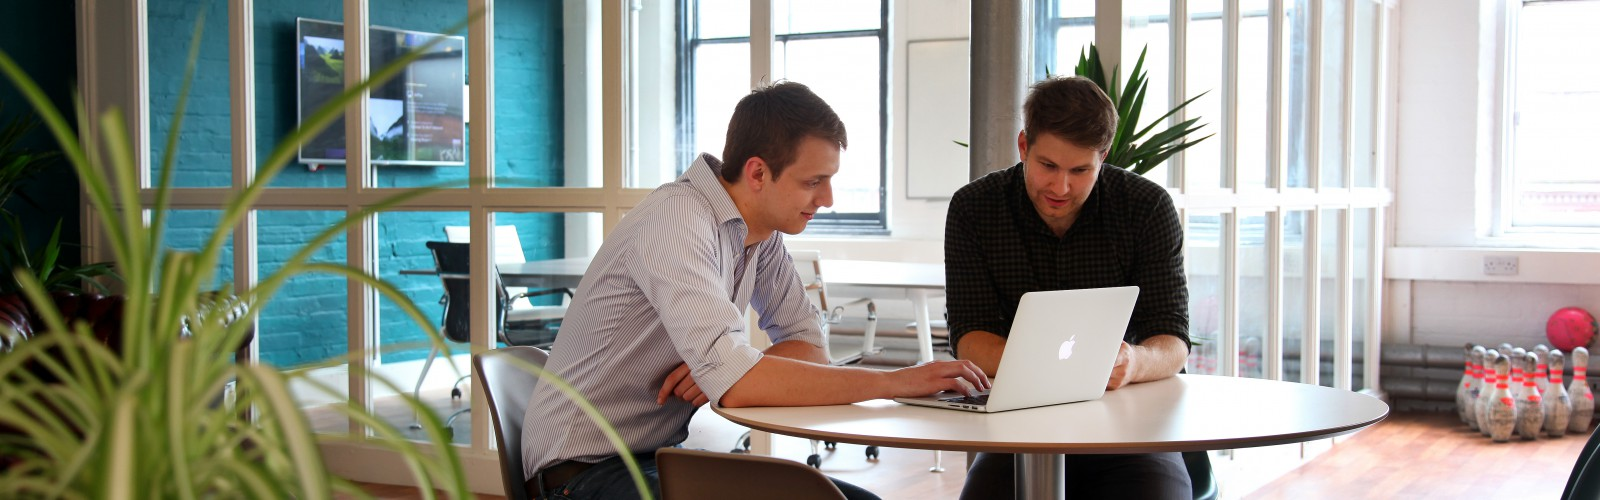 Impression founders Aaron Dicks (left) and Tom Craig